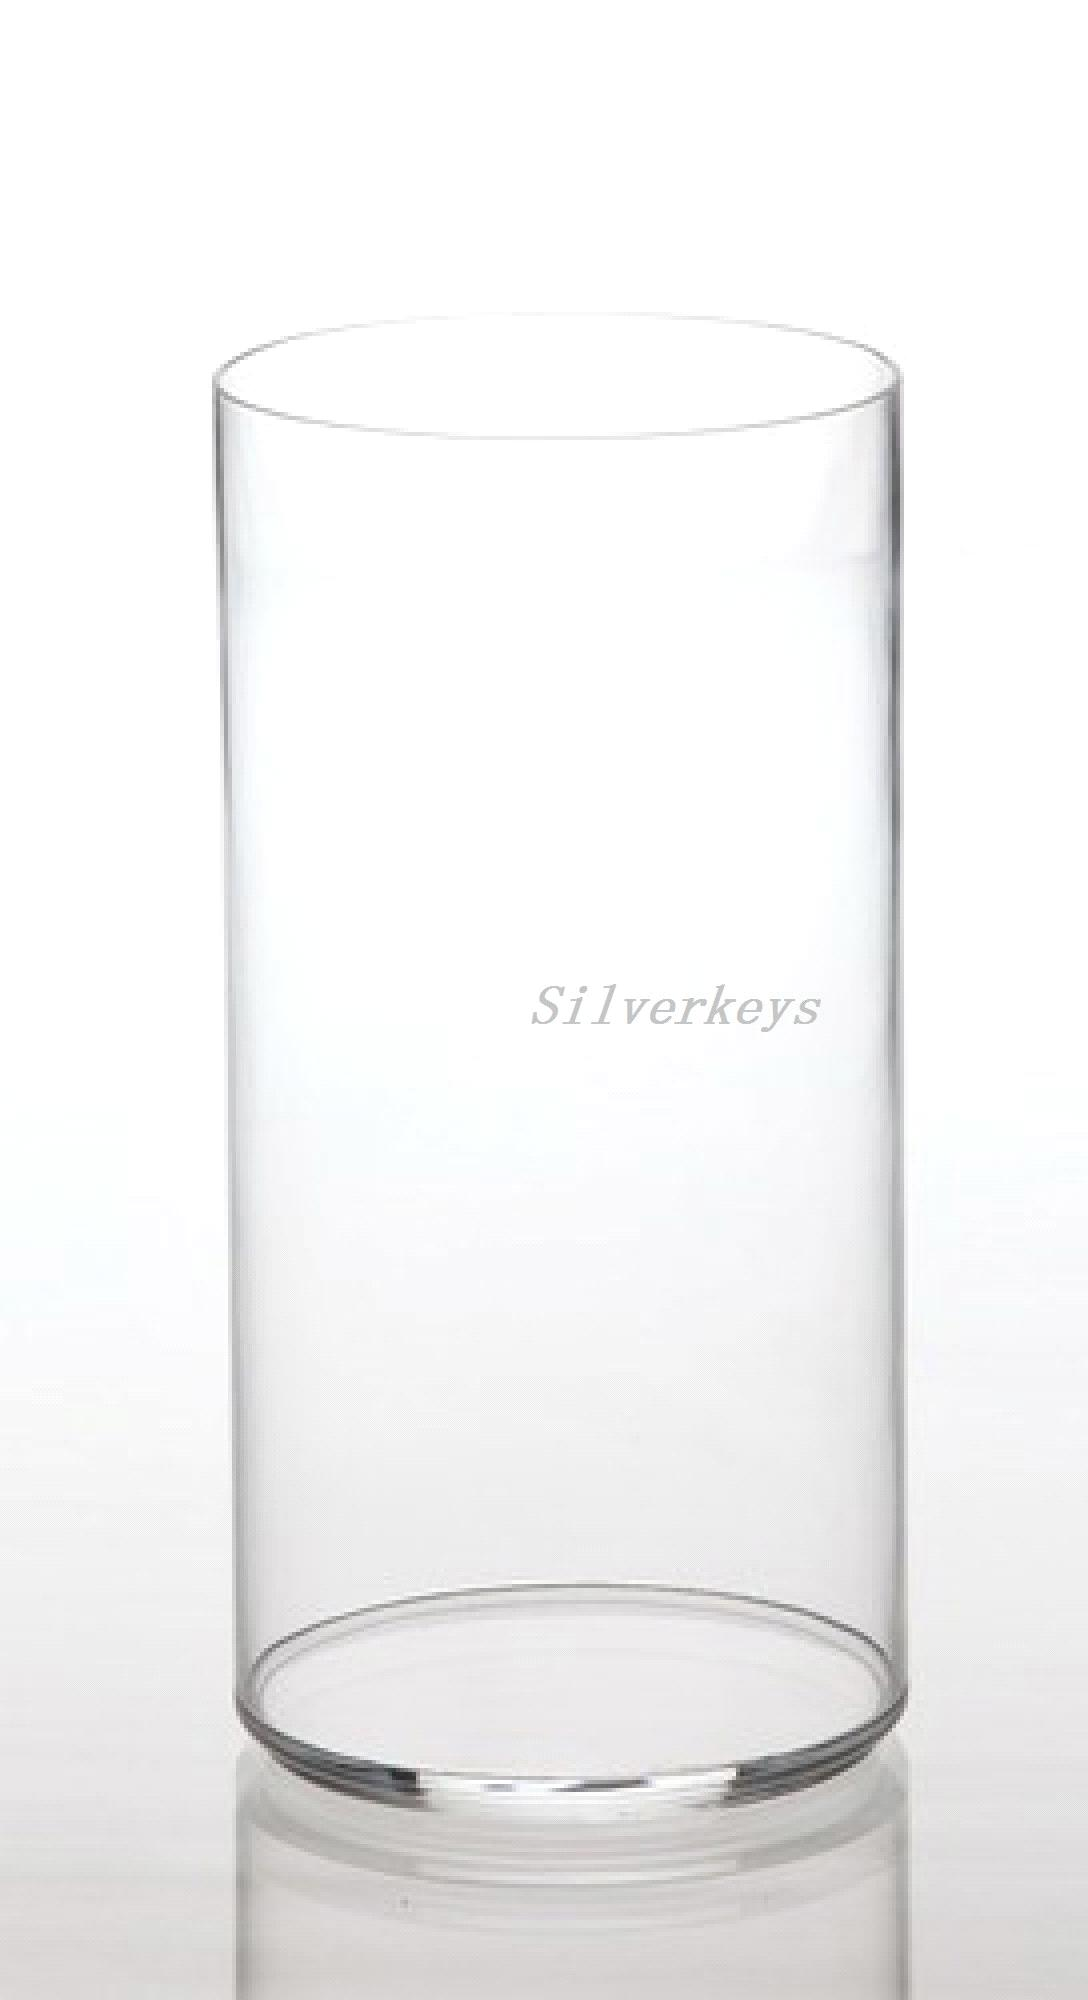 Columniform vase purchasing souring agent ecvv purchasing columniform vase reviewsmspy